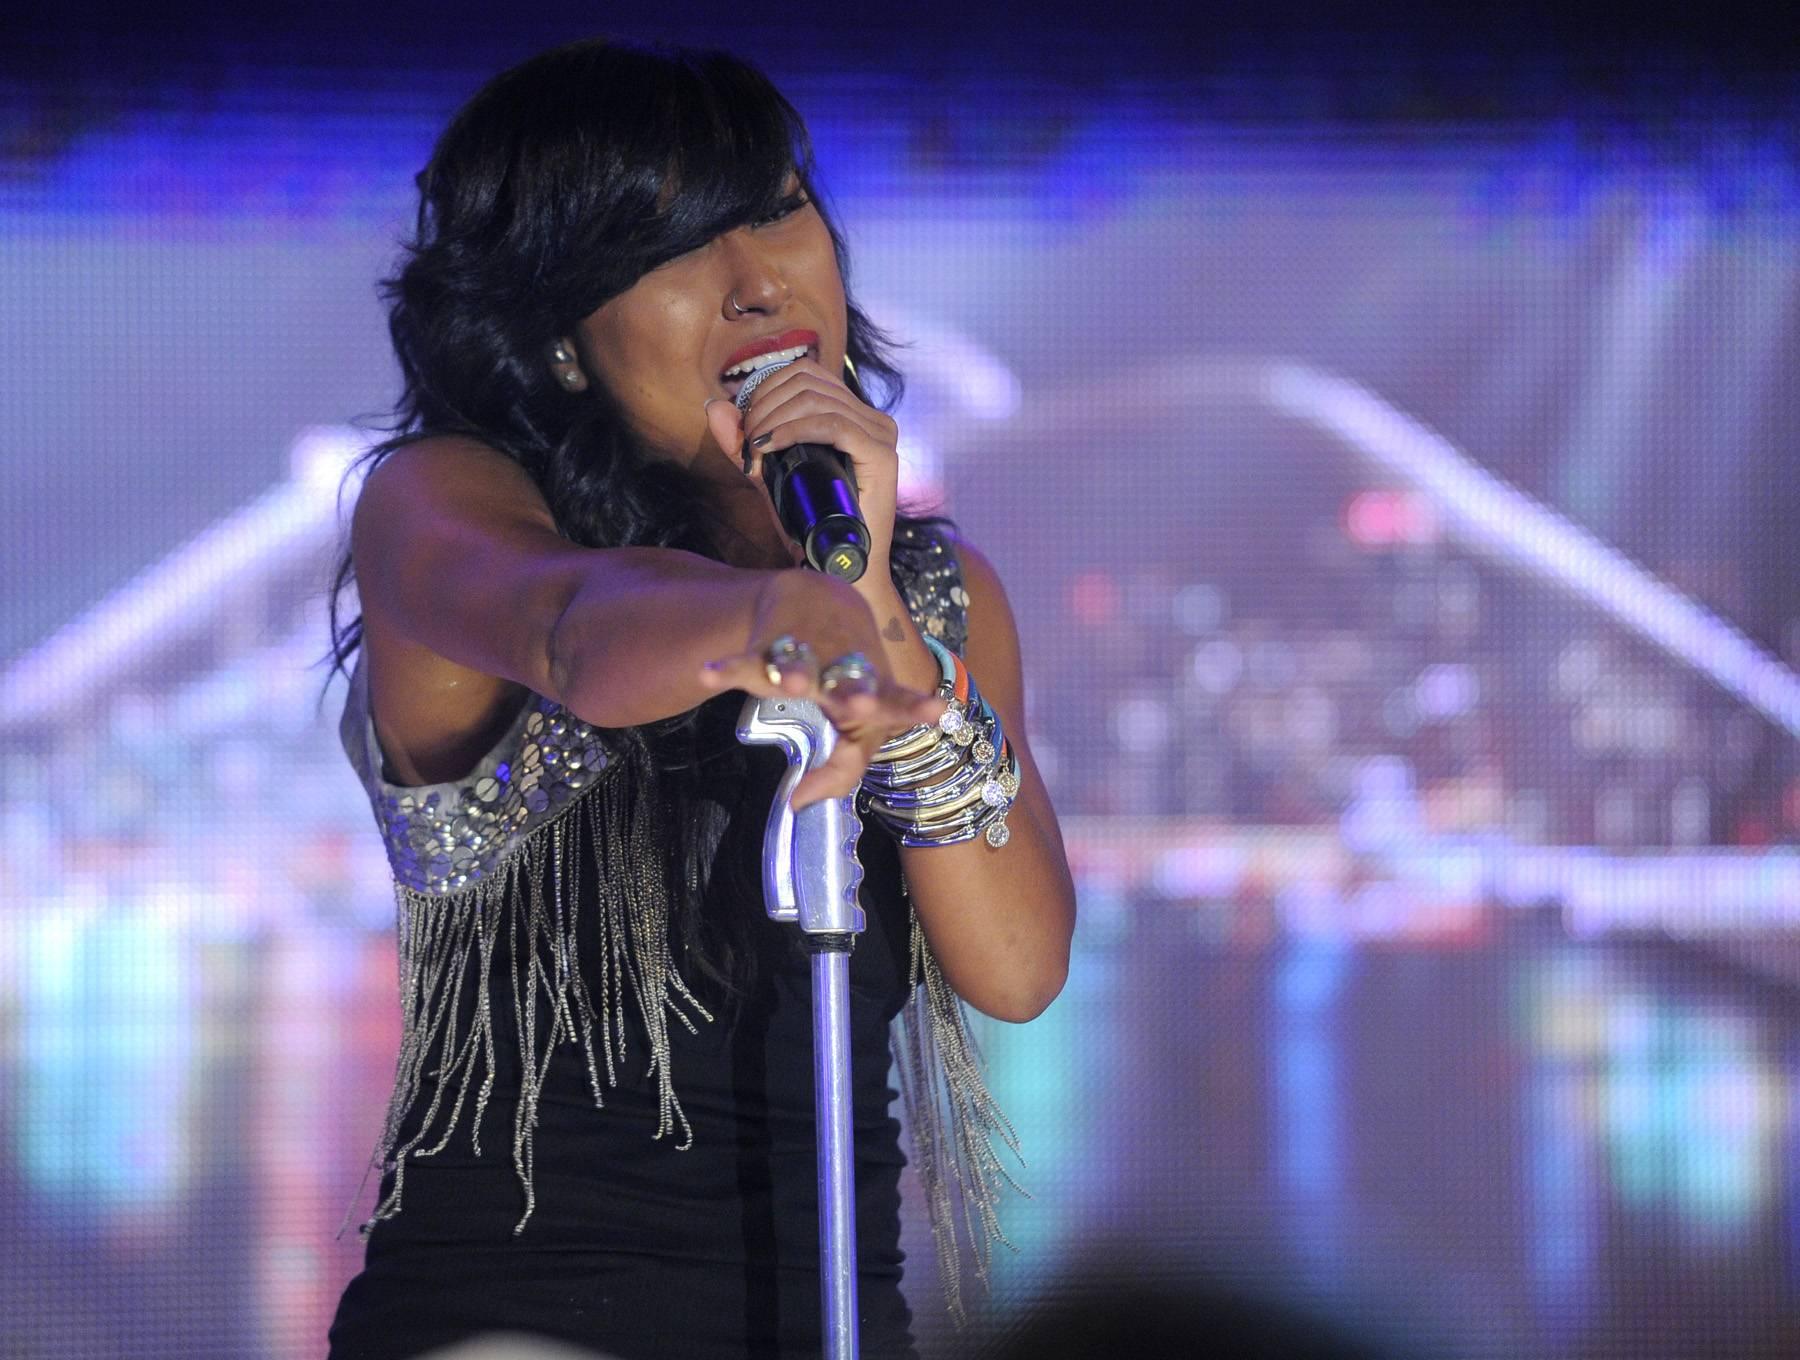 Sing It, Girl! - Melanie Fiona performs at 106 & Park, May 22, 2012. (Photo: John Ricard / BET)